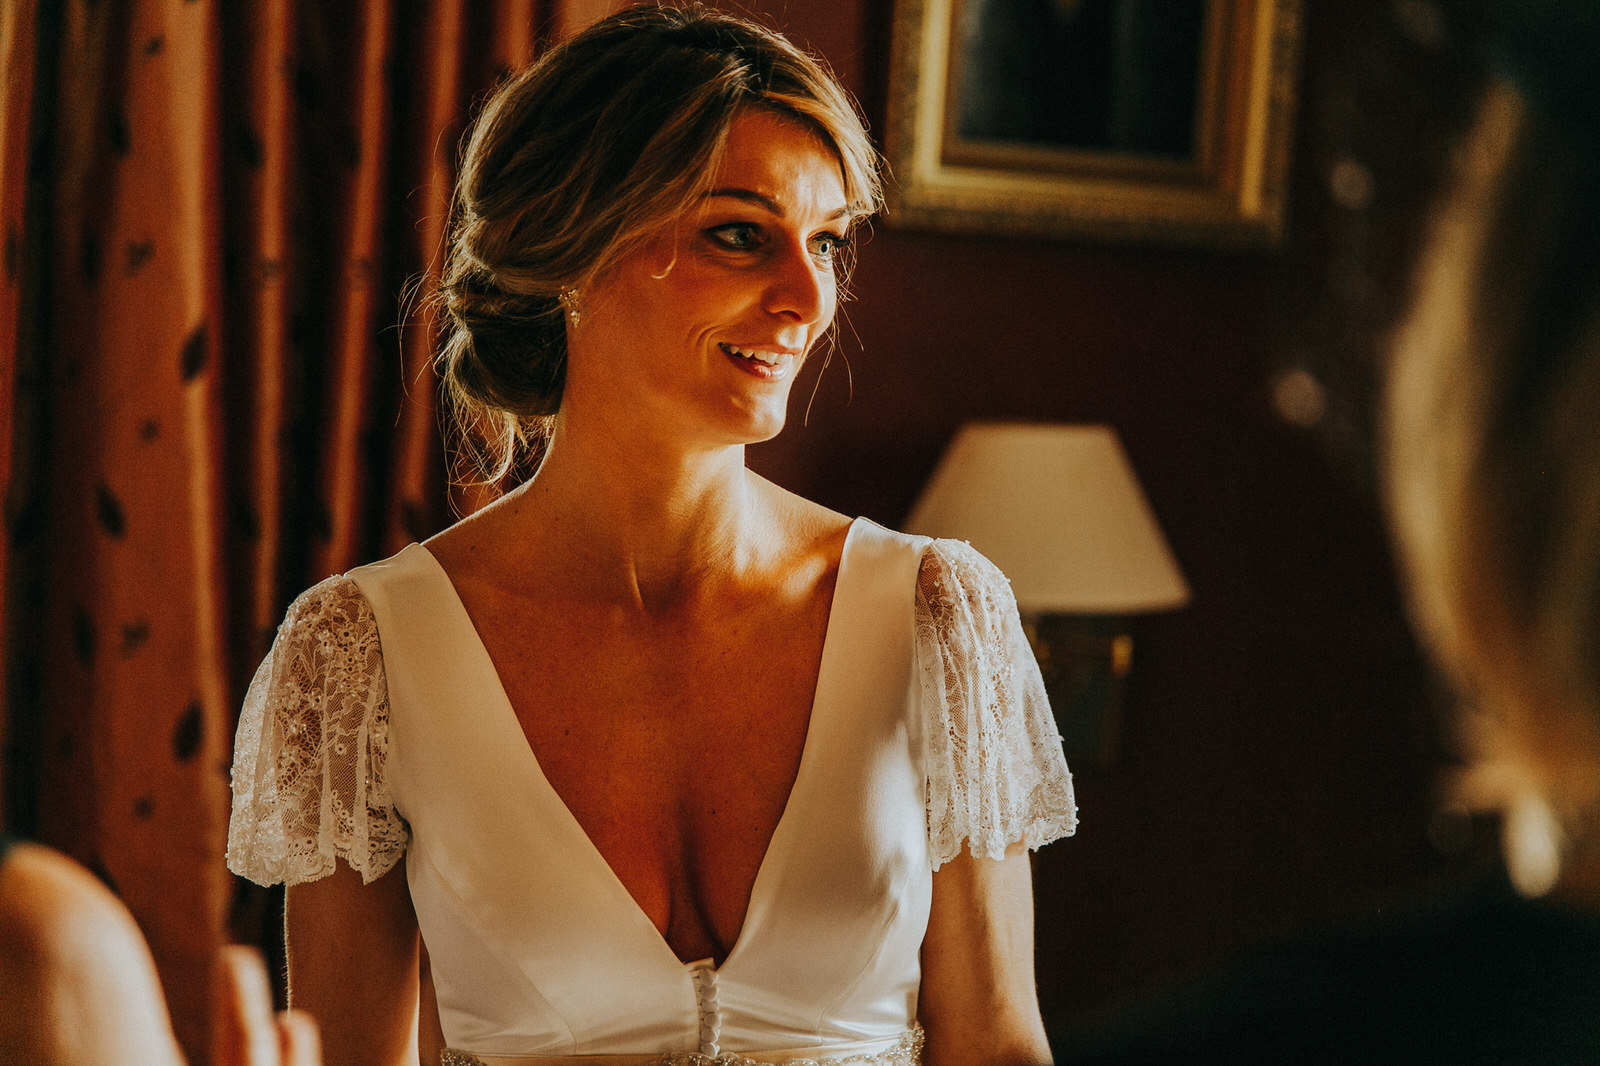 Dunbrody_House_Wedding_photographer_040.jpg